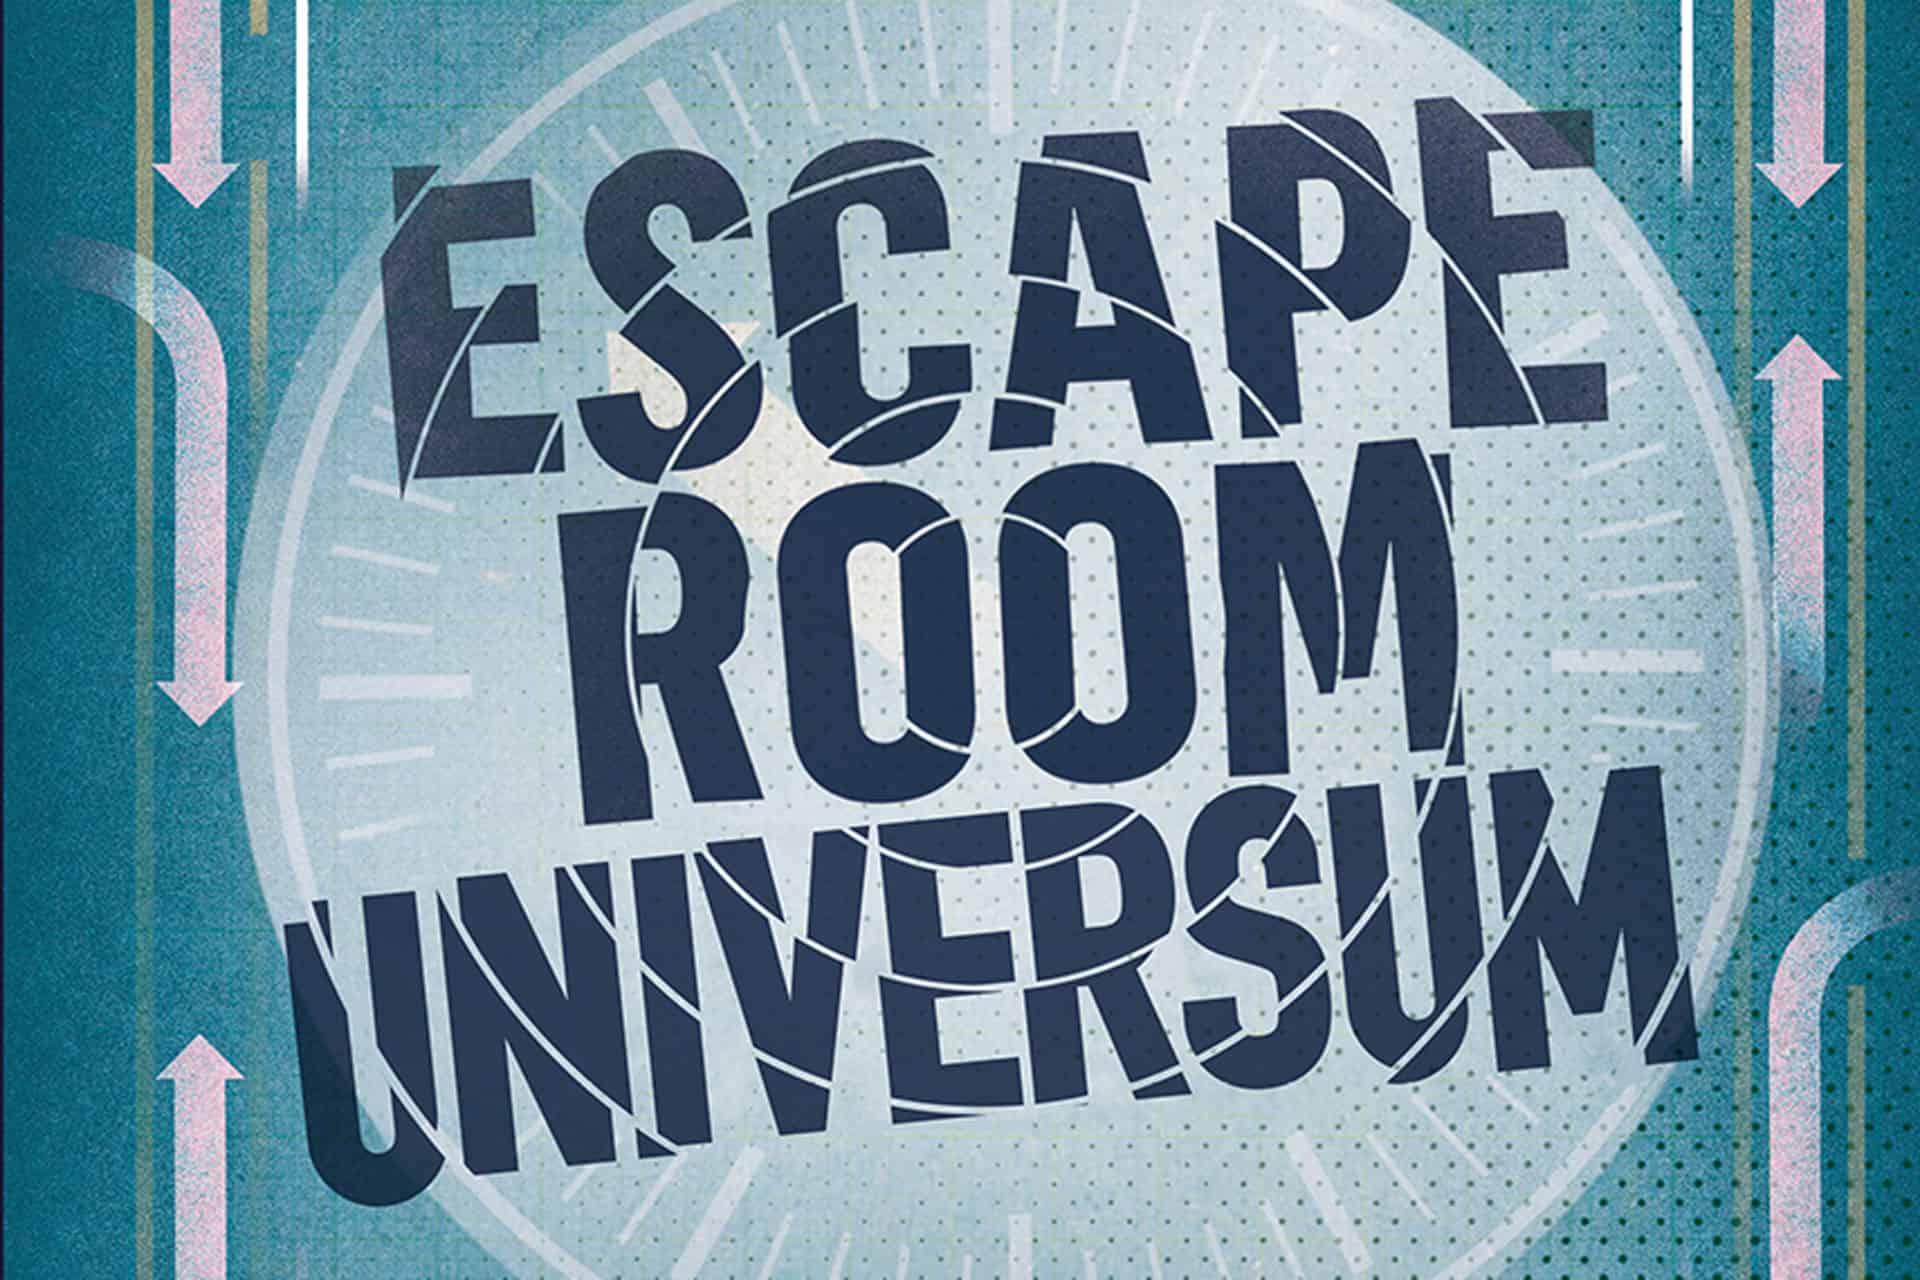 Das Cover von Escape Room Universe. Foto: Ullmann Medien